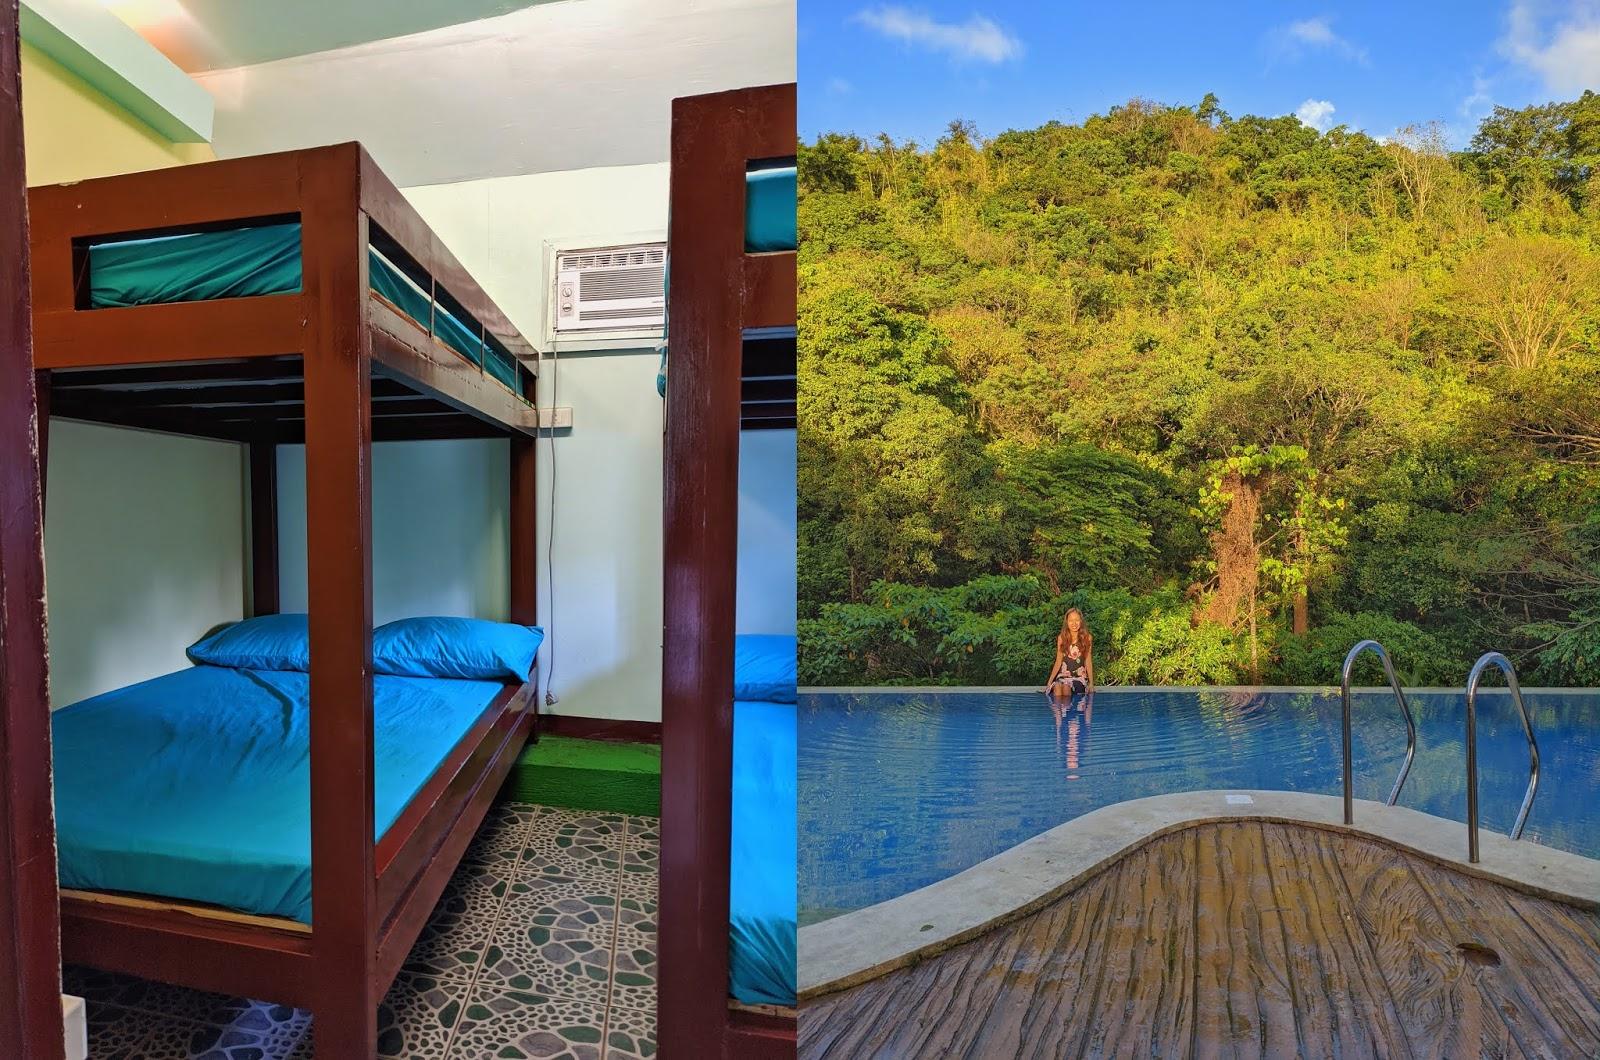 dream ridge resort in rizal